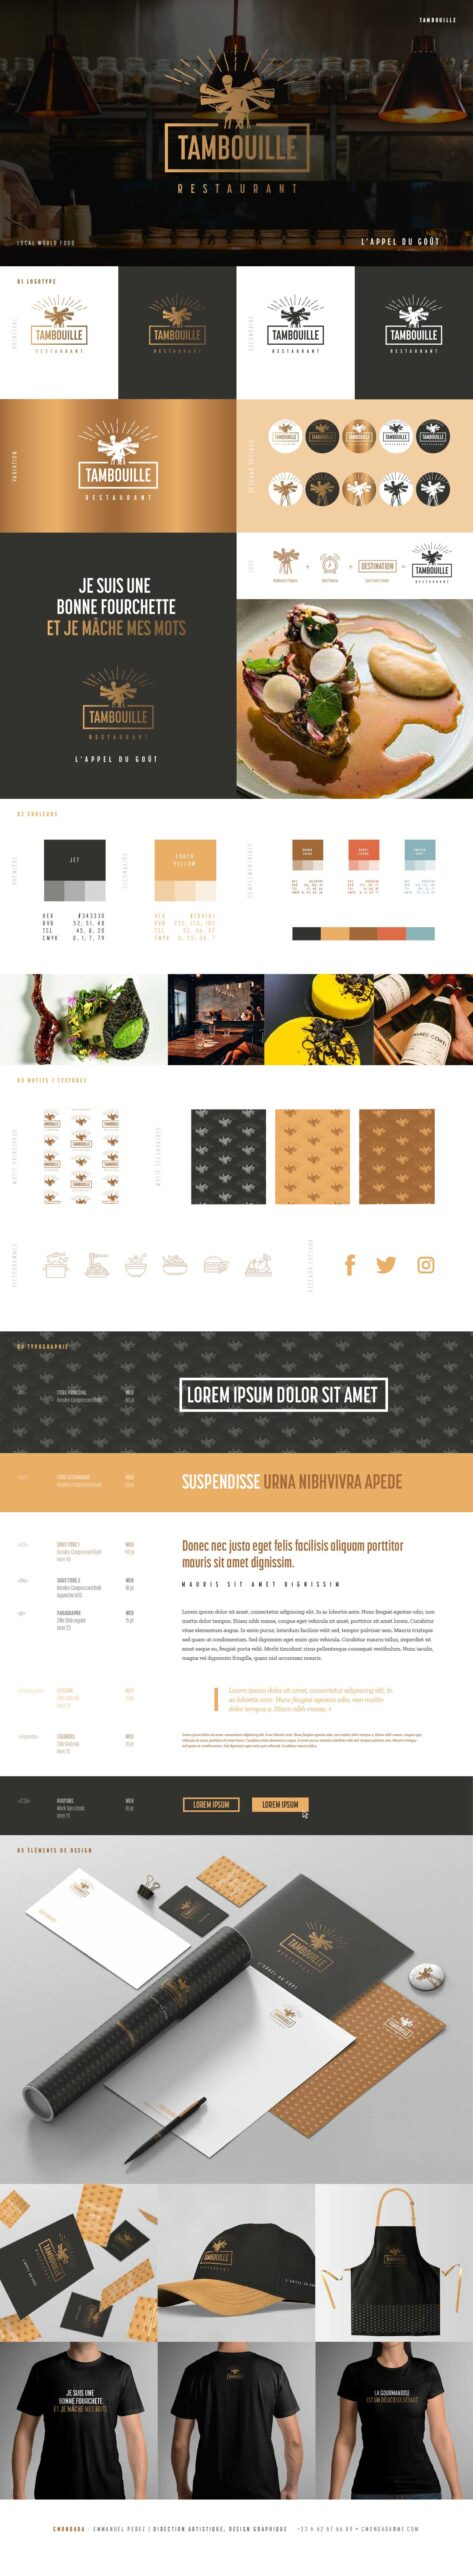 Brand-Board-Tambouille restaurant-Cmondada Design